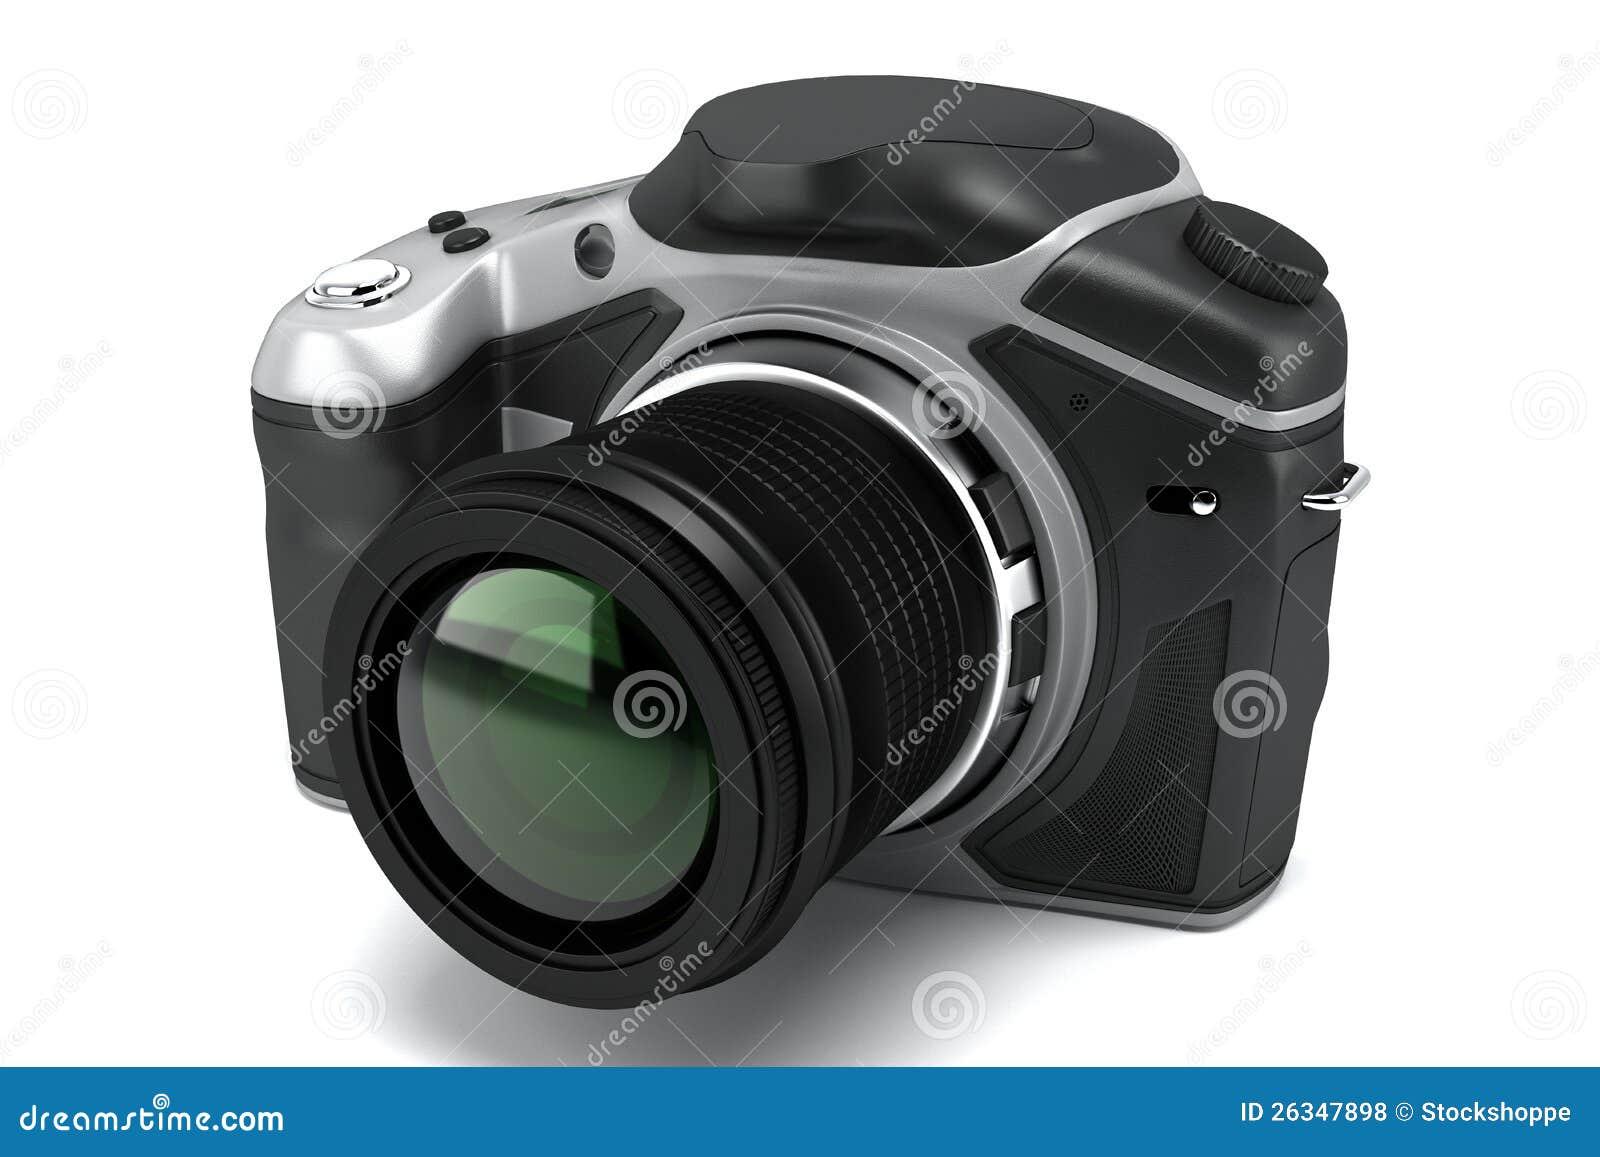 free clipart slr camera - photo #44